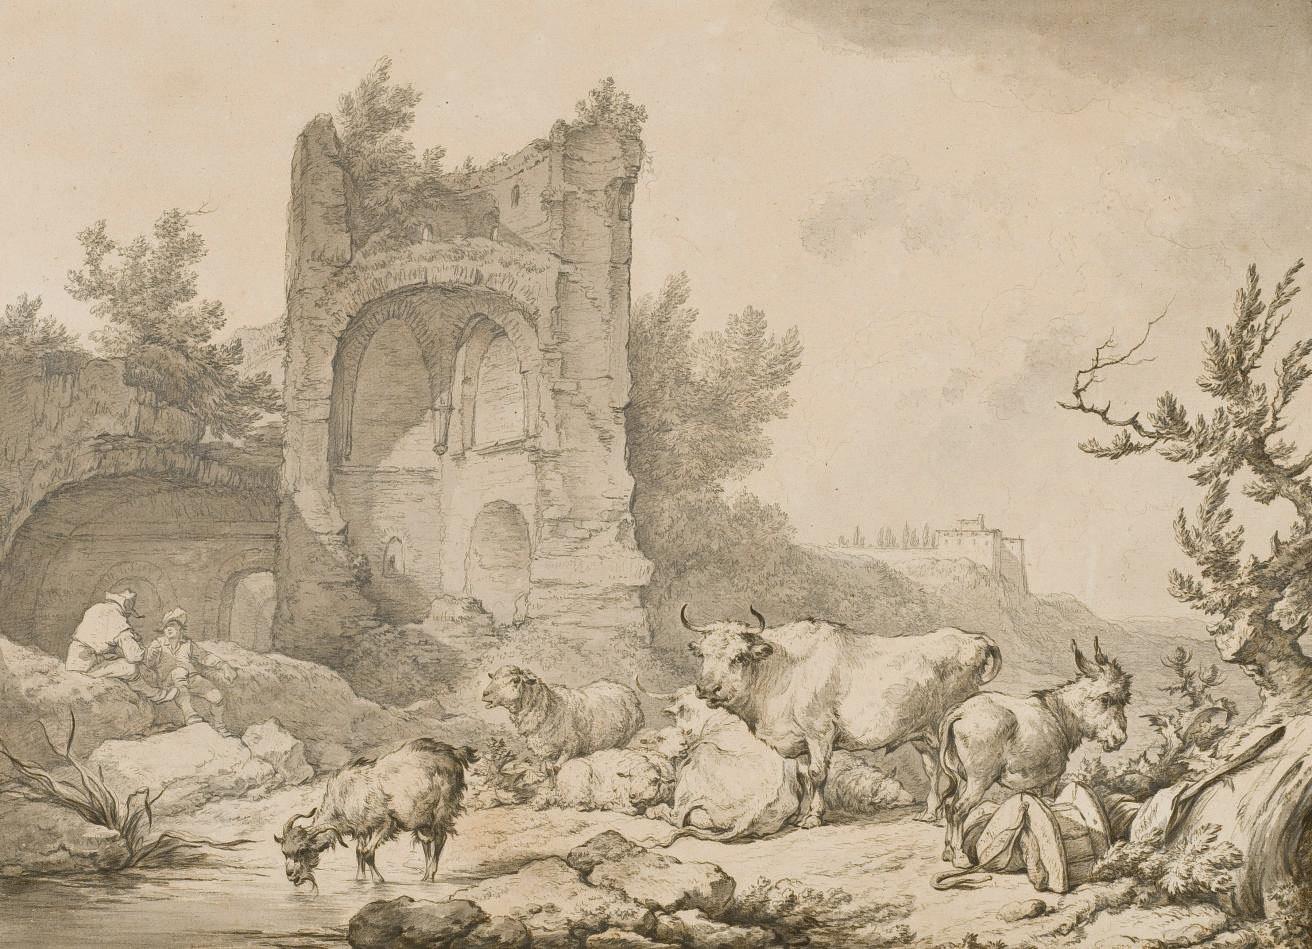 PHILIPPE-JACQUES DE LOUTHERBOU